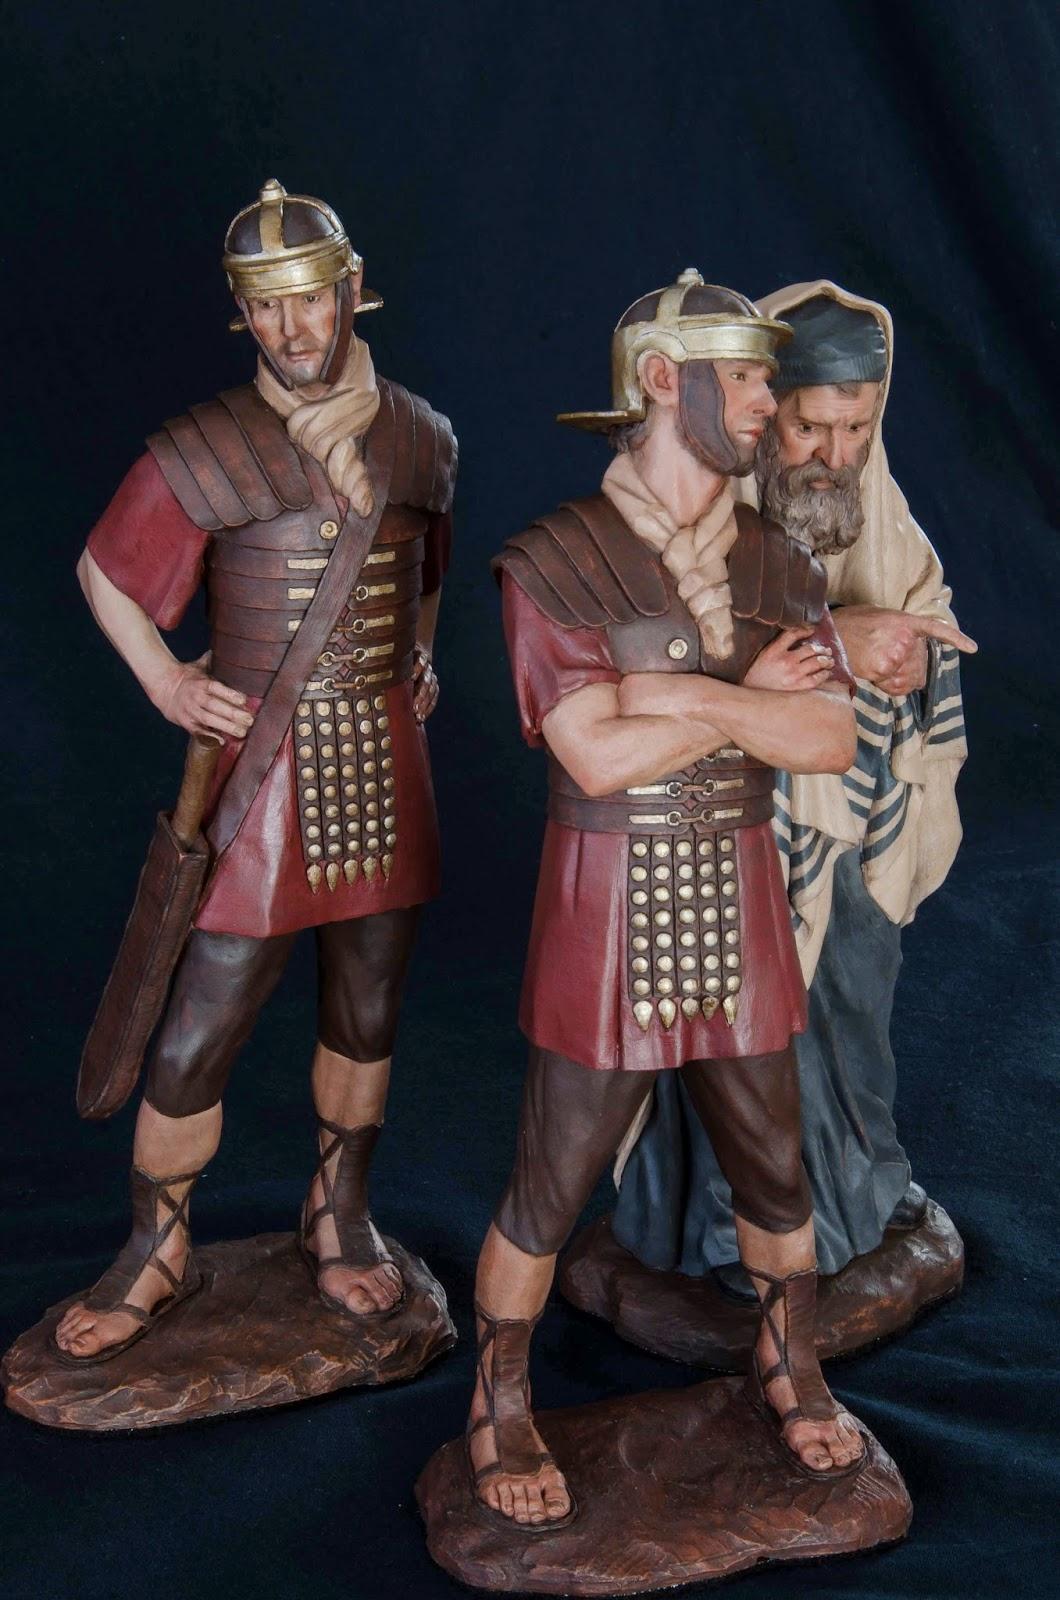 Belén presepe nativitykrippeArturo Serra escultura barro cocido 2